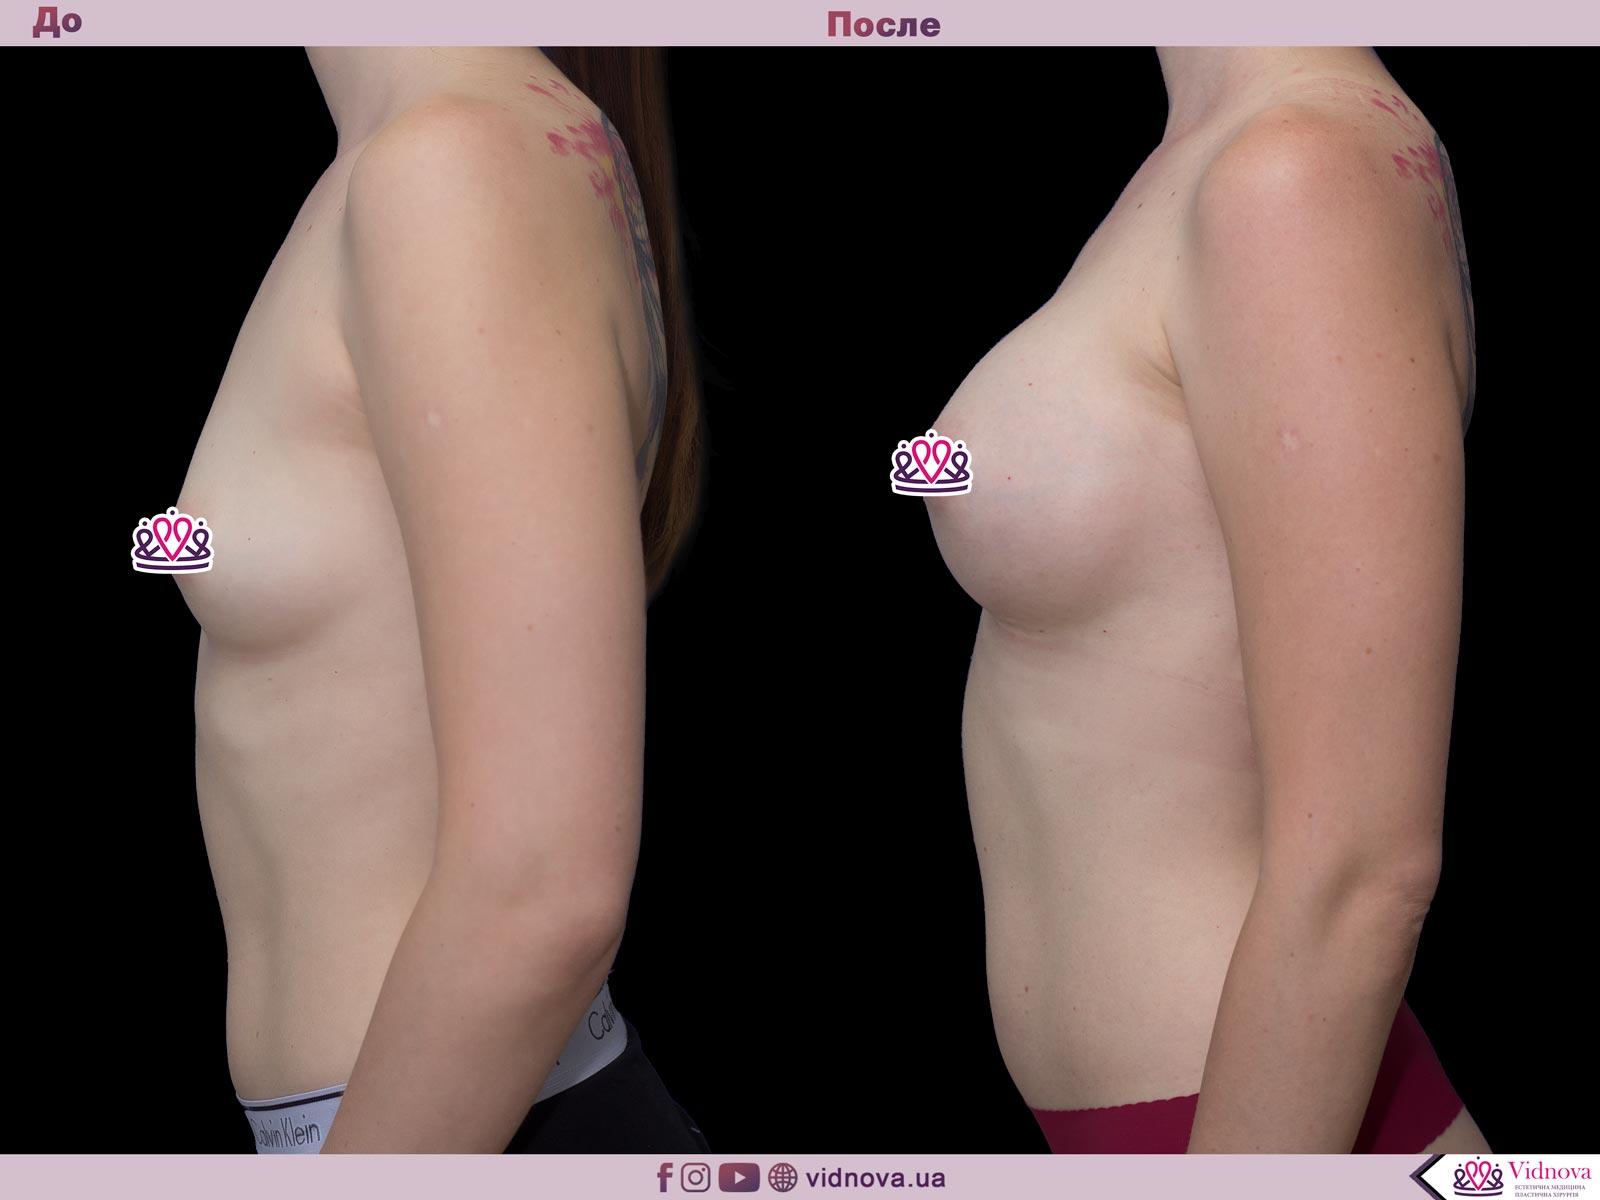 Увеличение груди: Фото ДО и ПОСЛЕ - Пример №45-3 - Клиника Vidnova